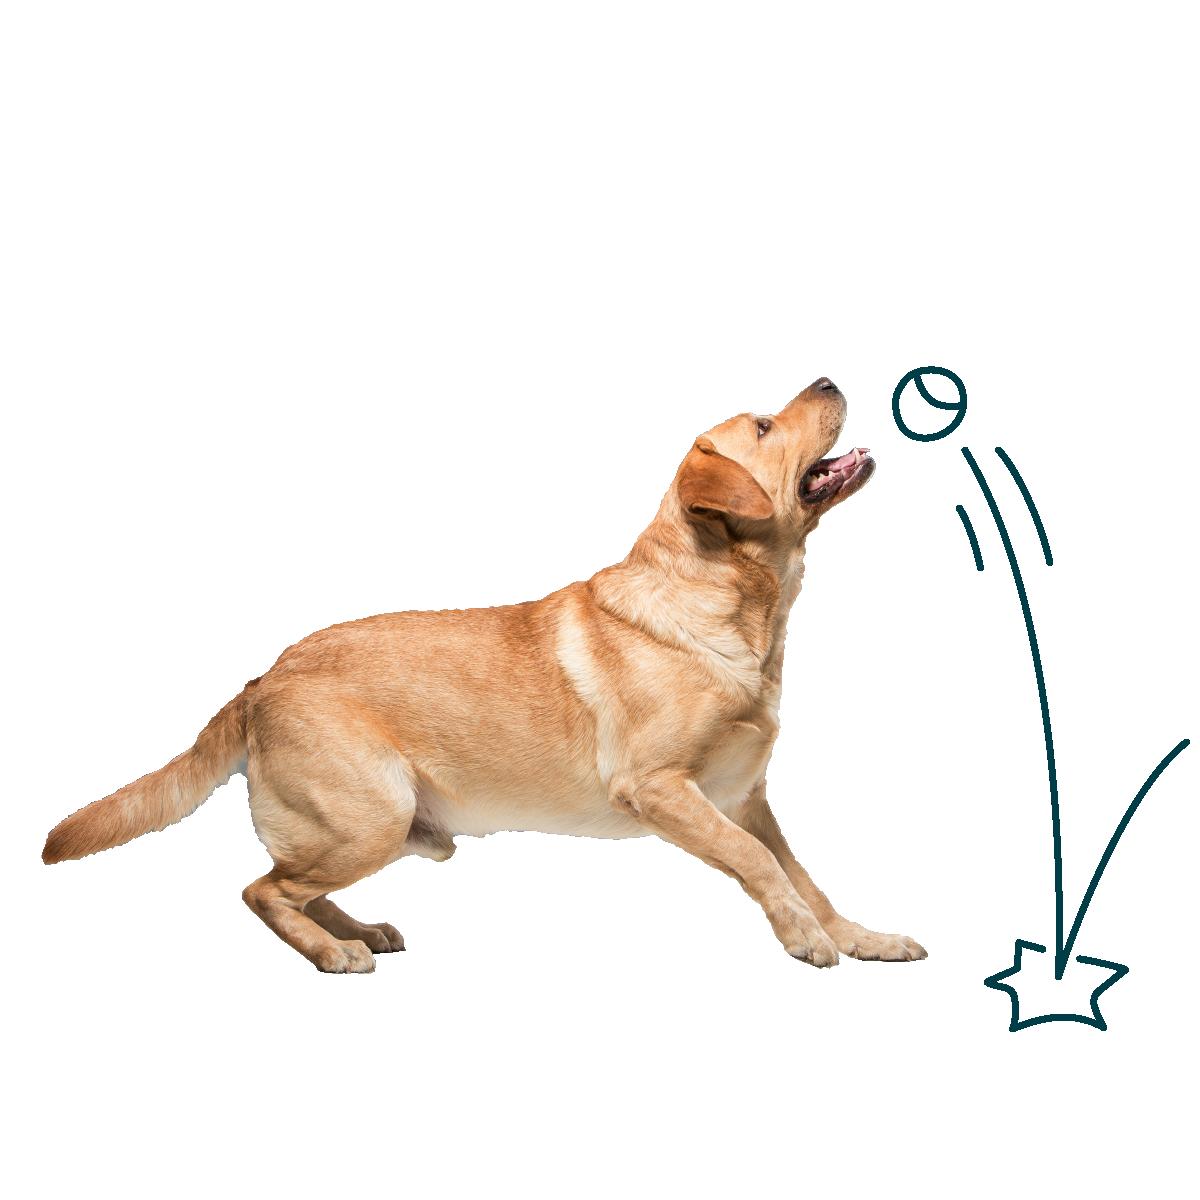 Dog catching a bouncing ball